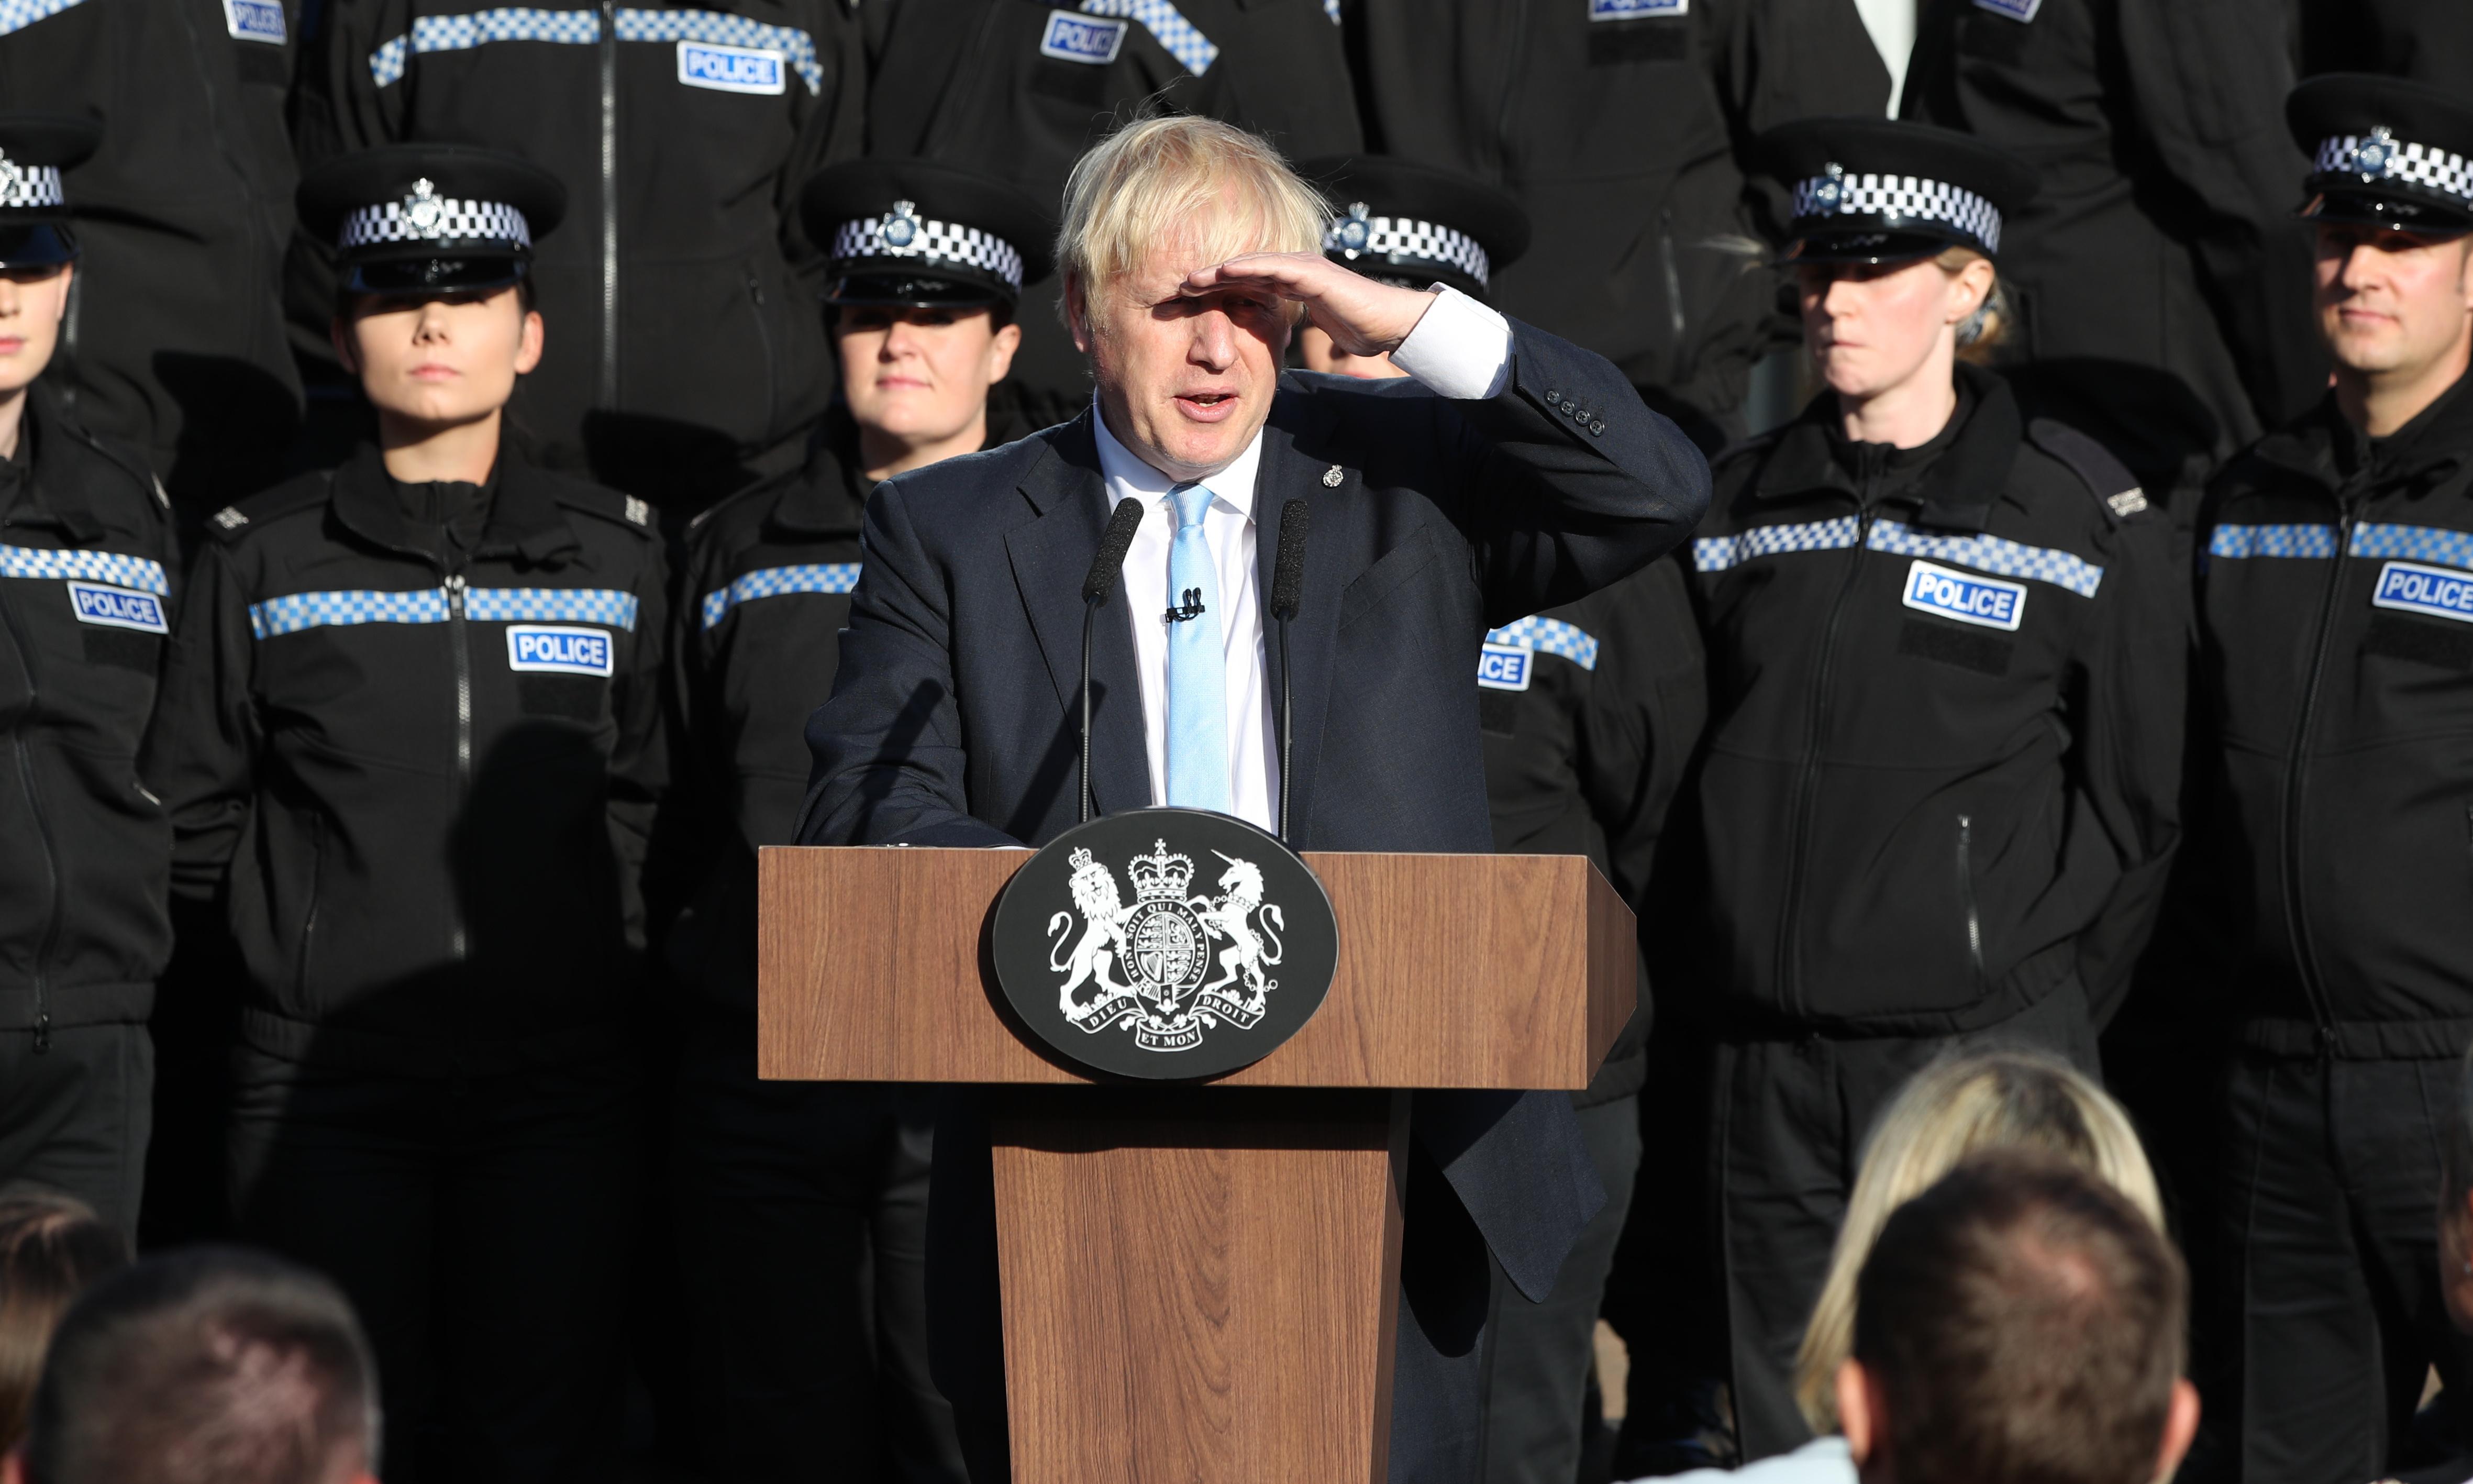 Cressida Dick criticises PM over speech to police recruits